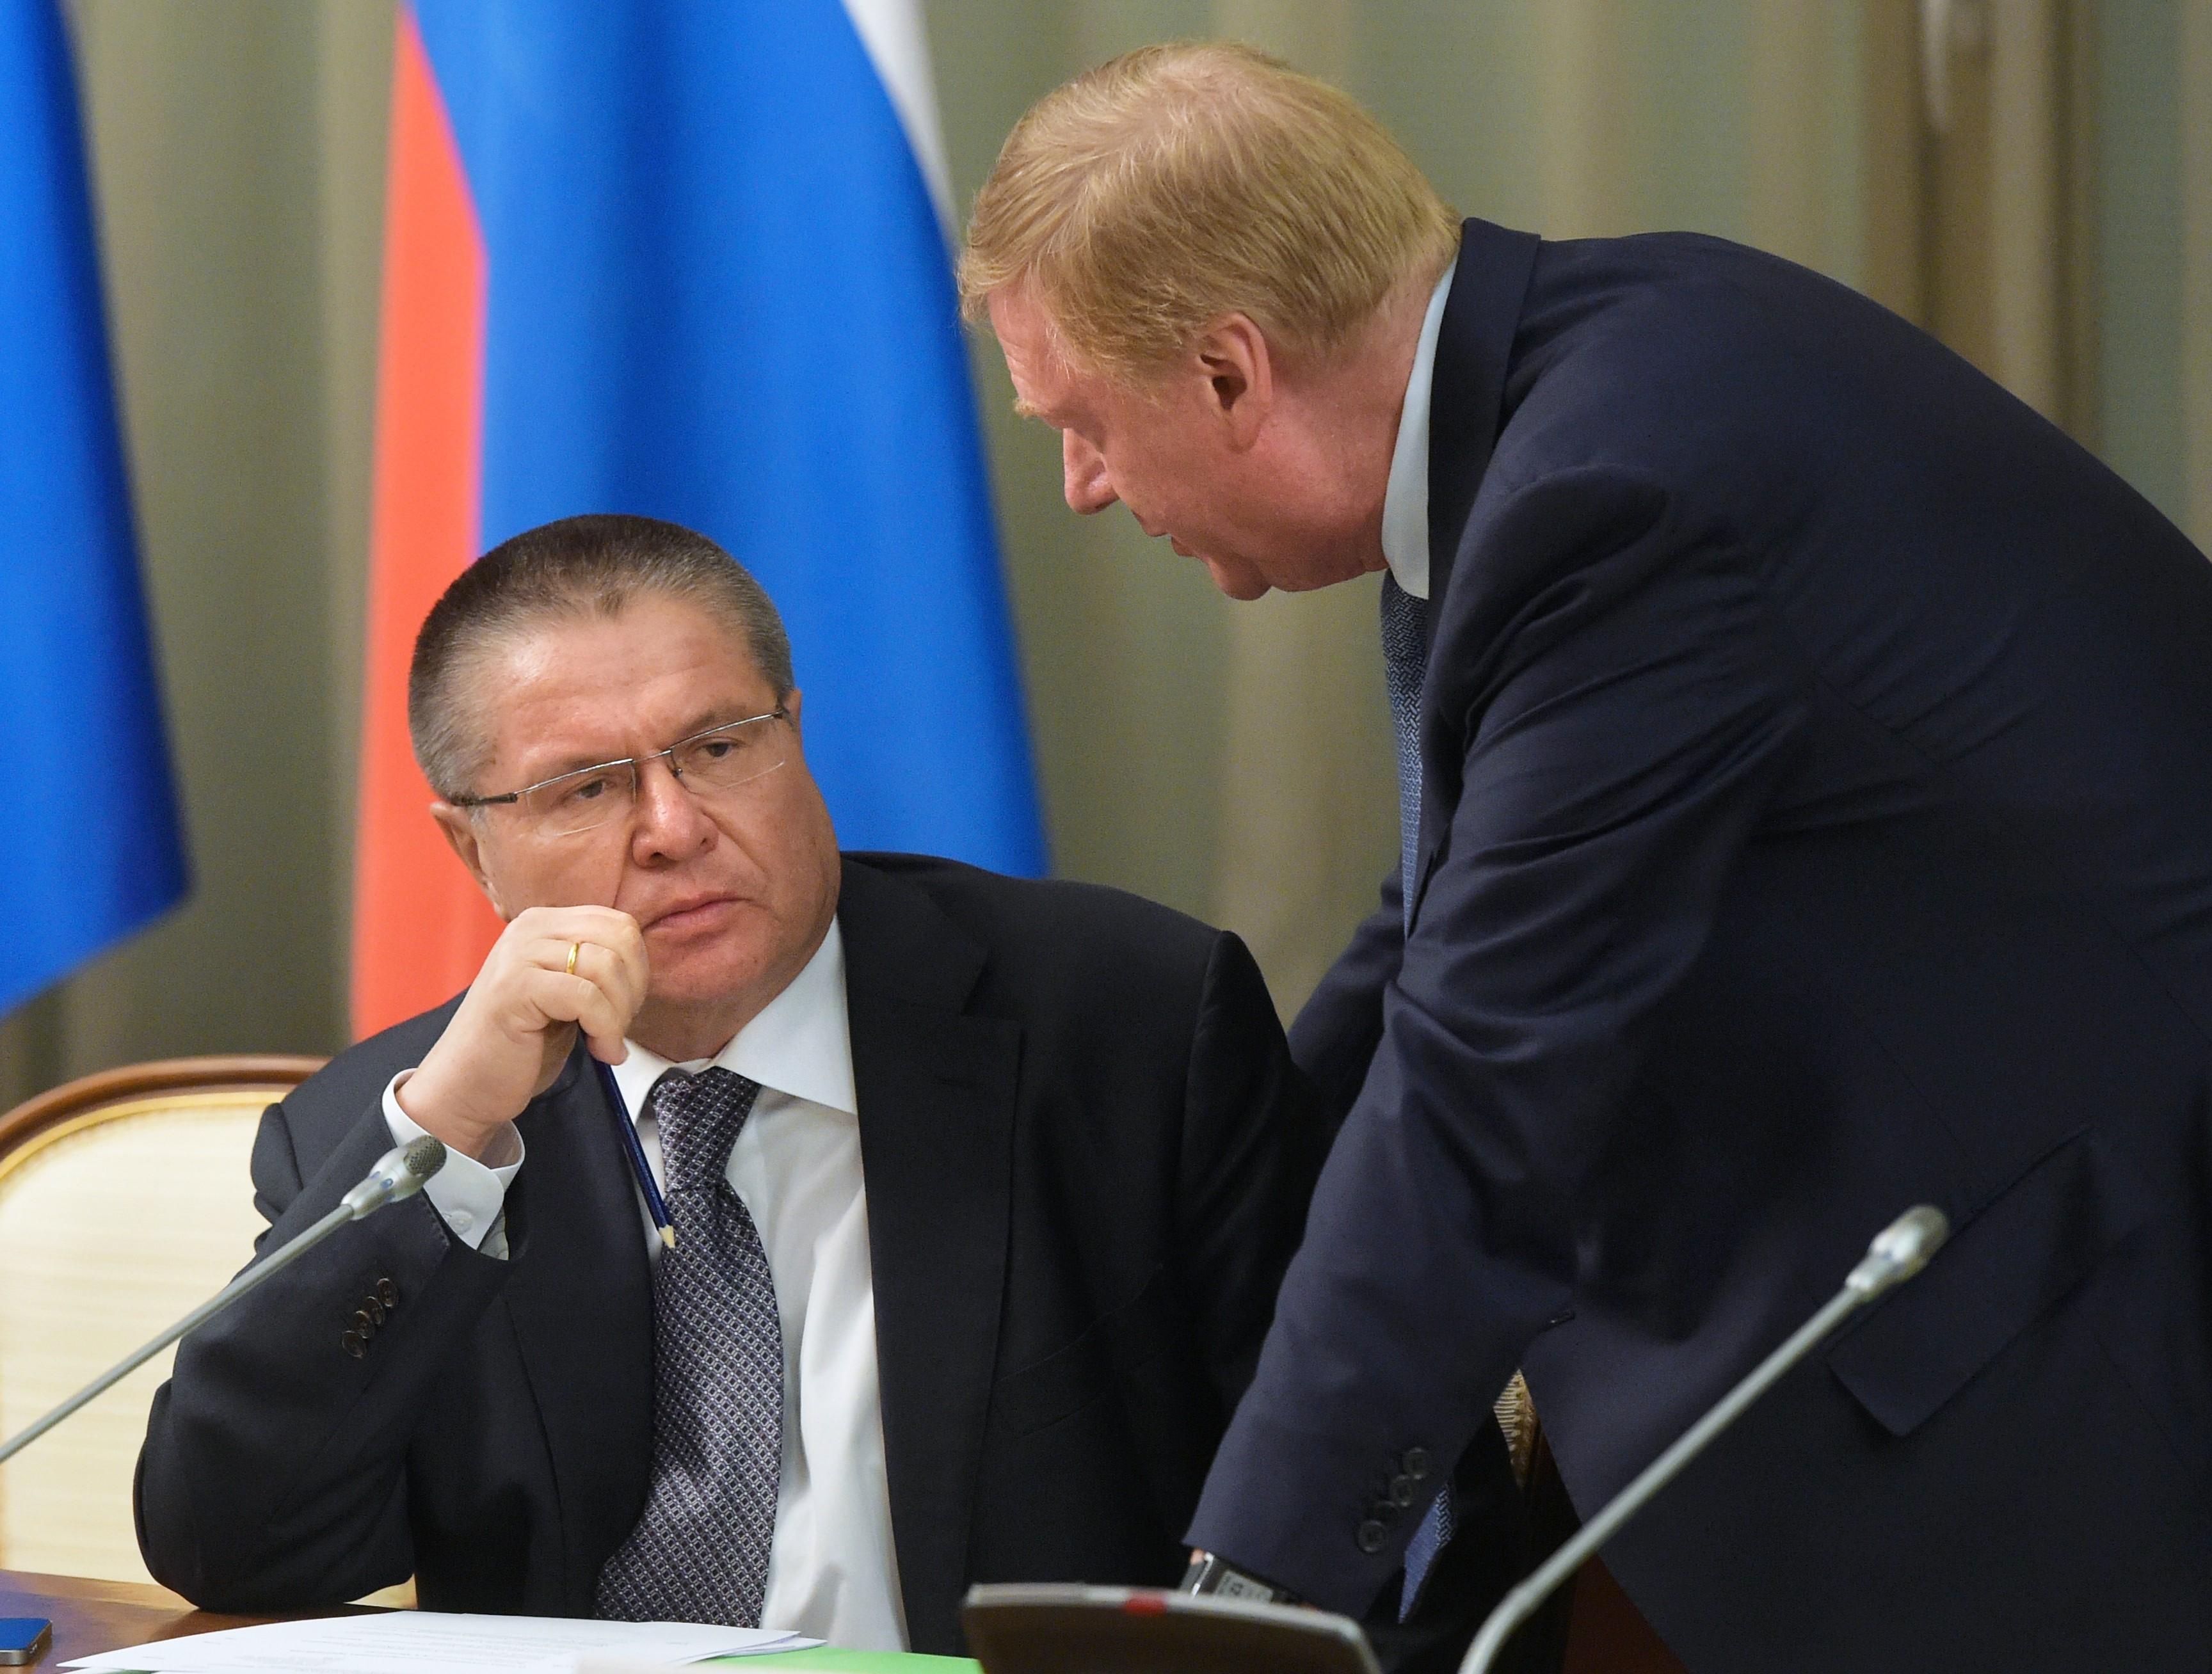 <p>Фото: &copy;РИА Новости/Александр Астафьев</p>